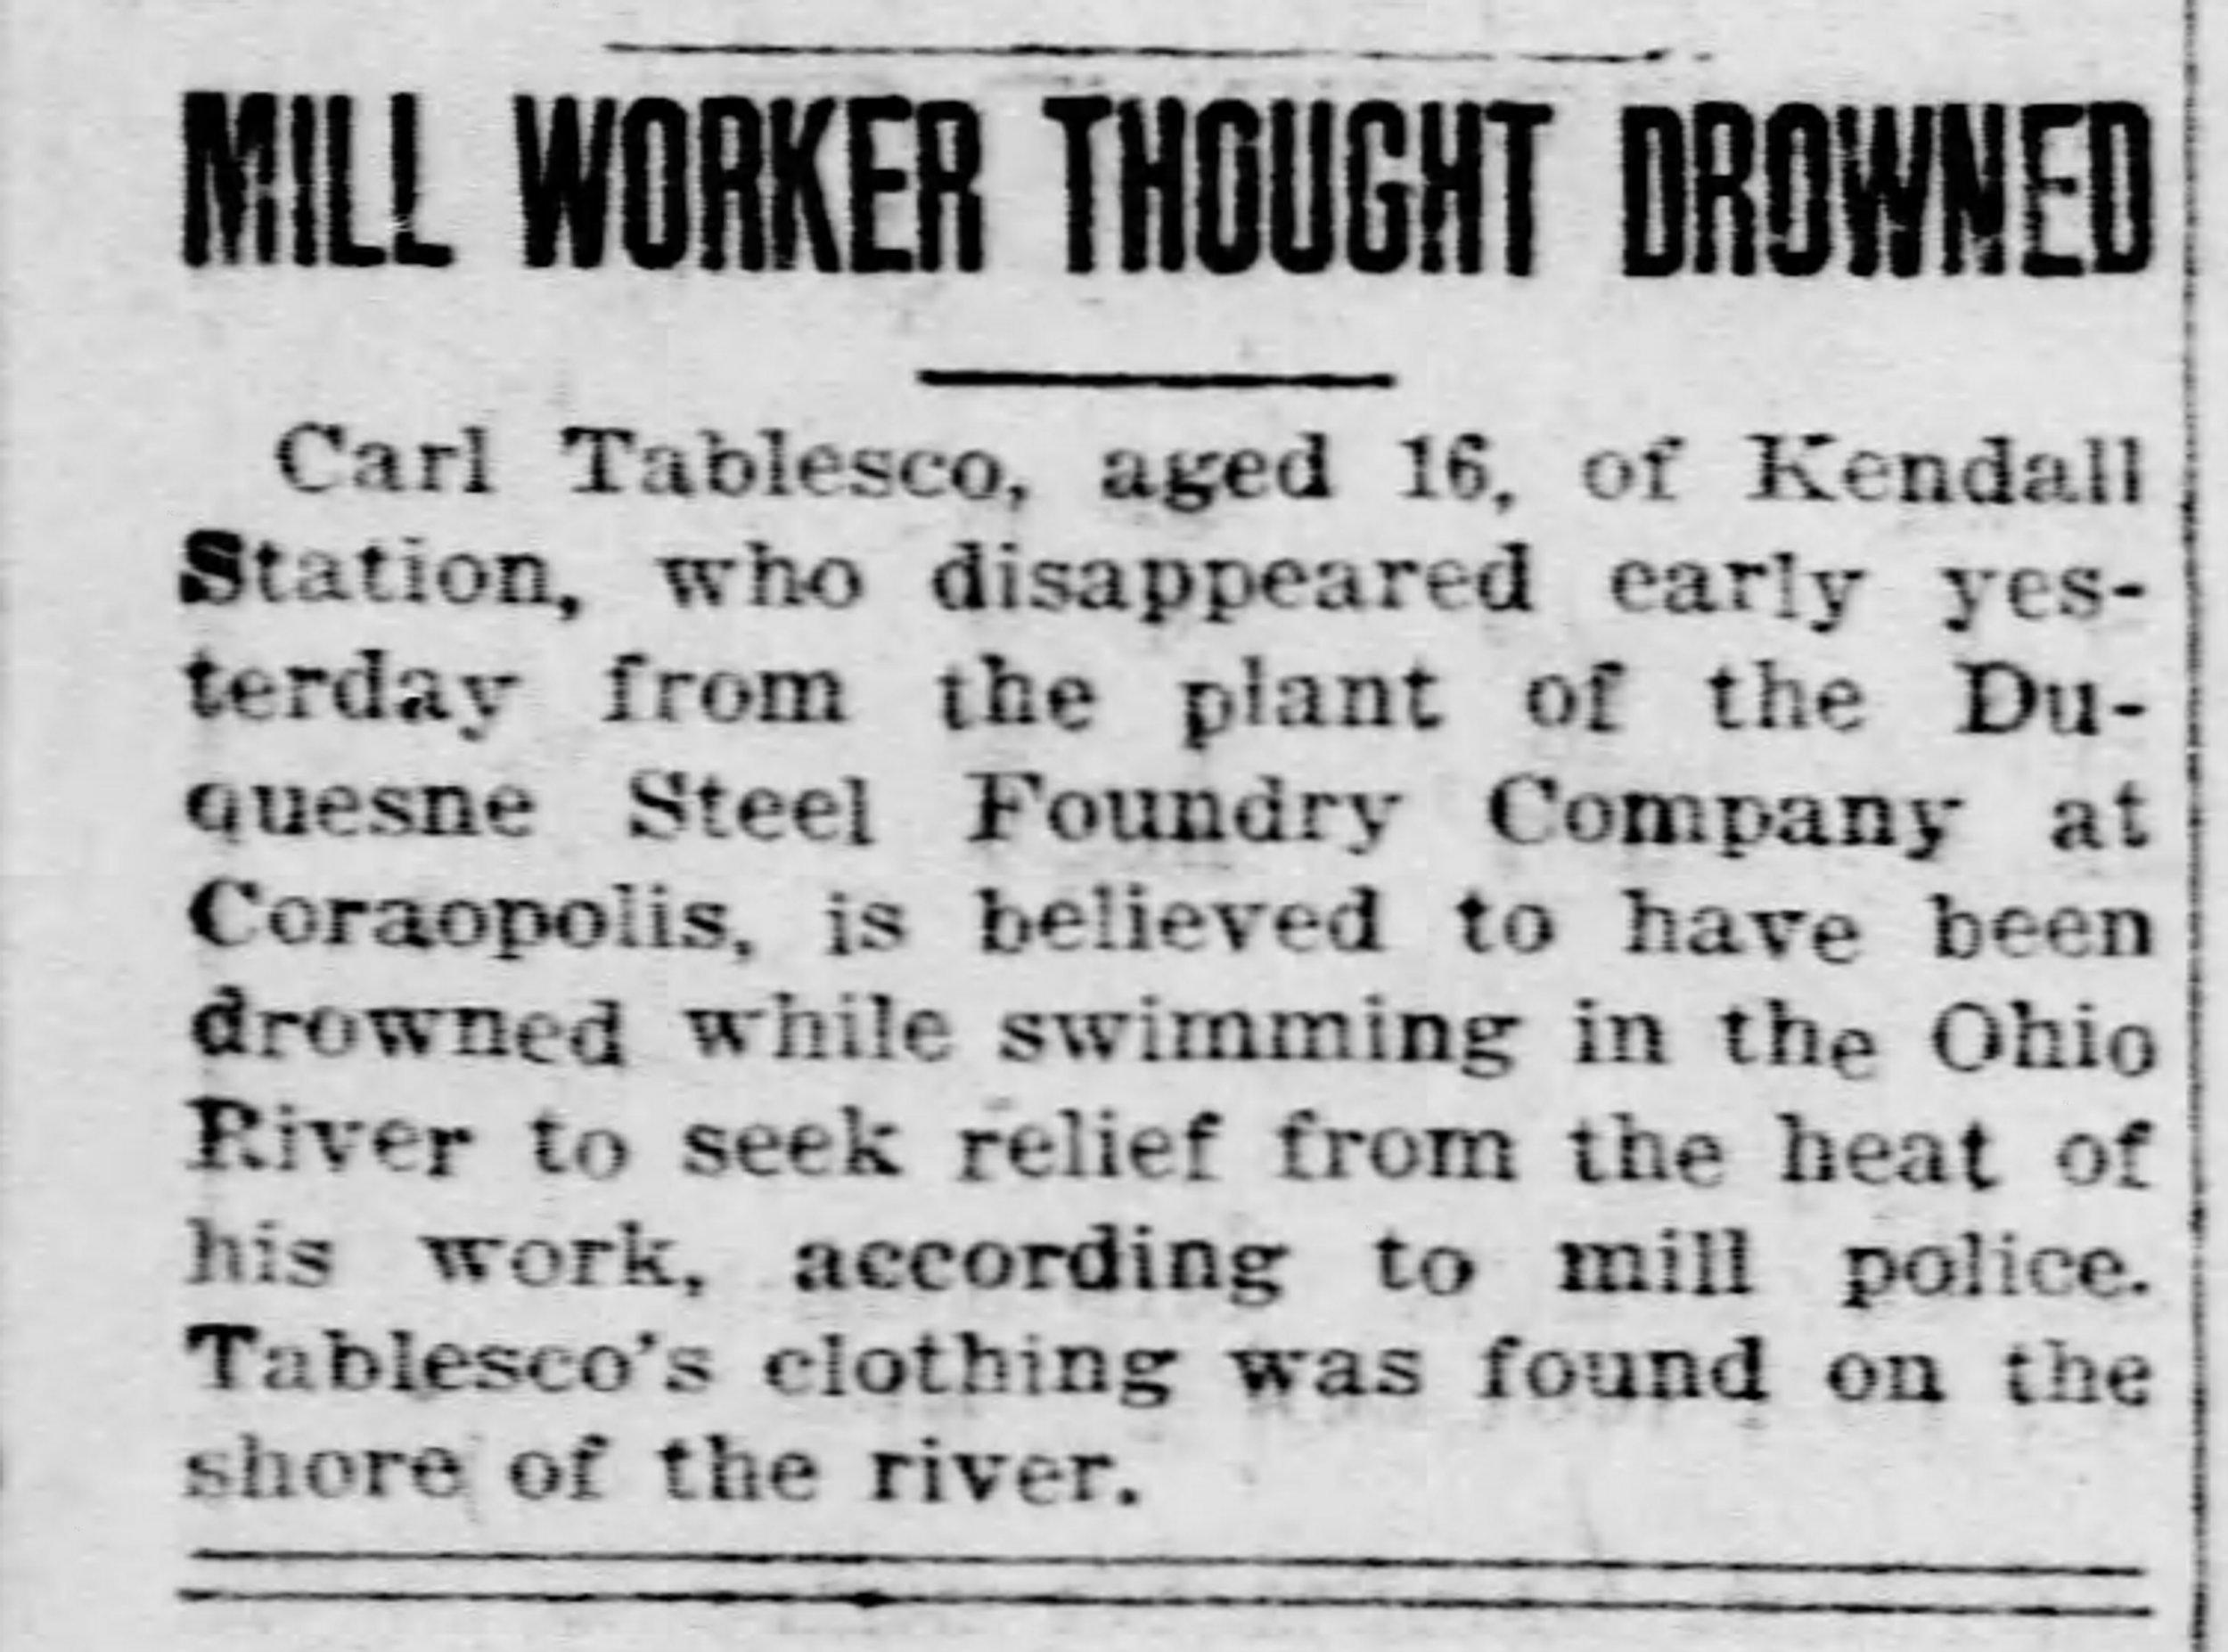 Pittsburgh Post Gazette, August 14, 1924